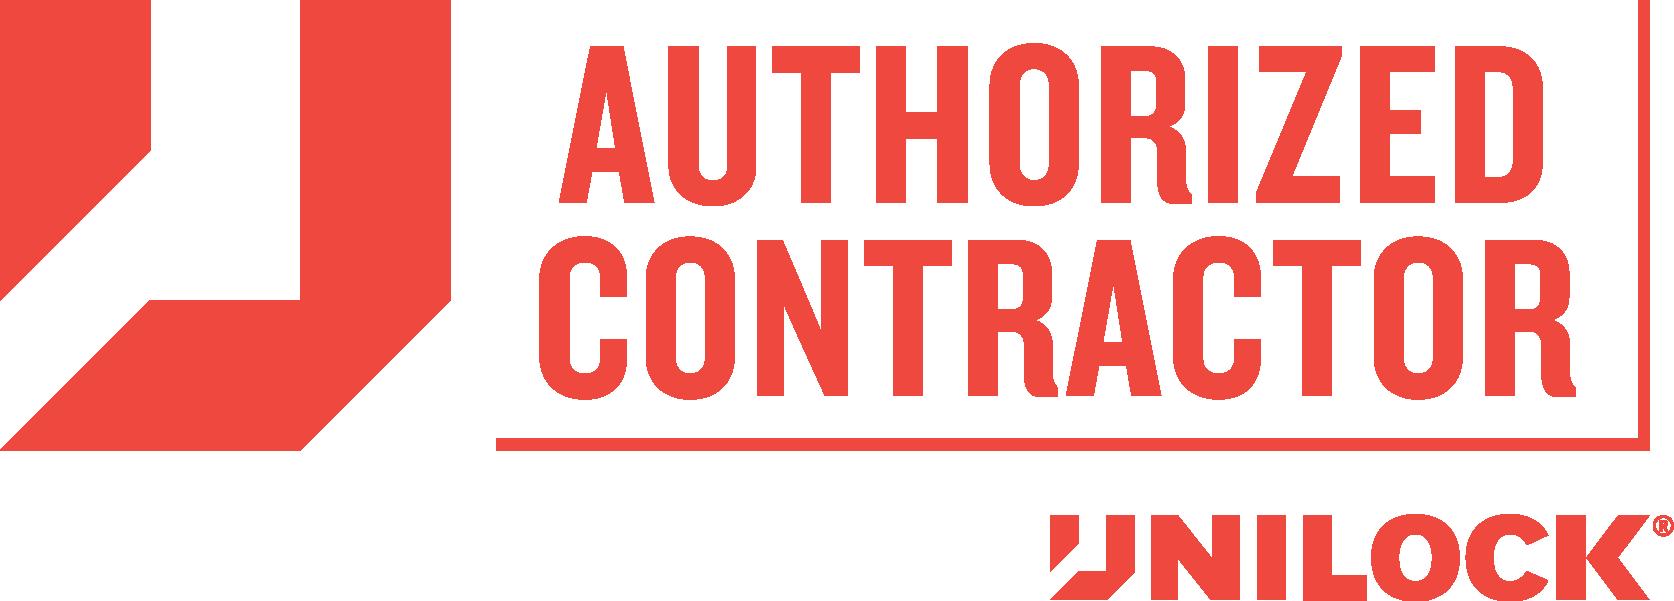 Unilock Authorized Contractor in West Bloomfield, MI, Metro Detroit